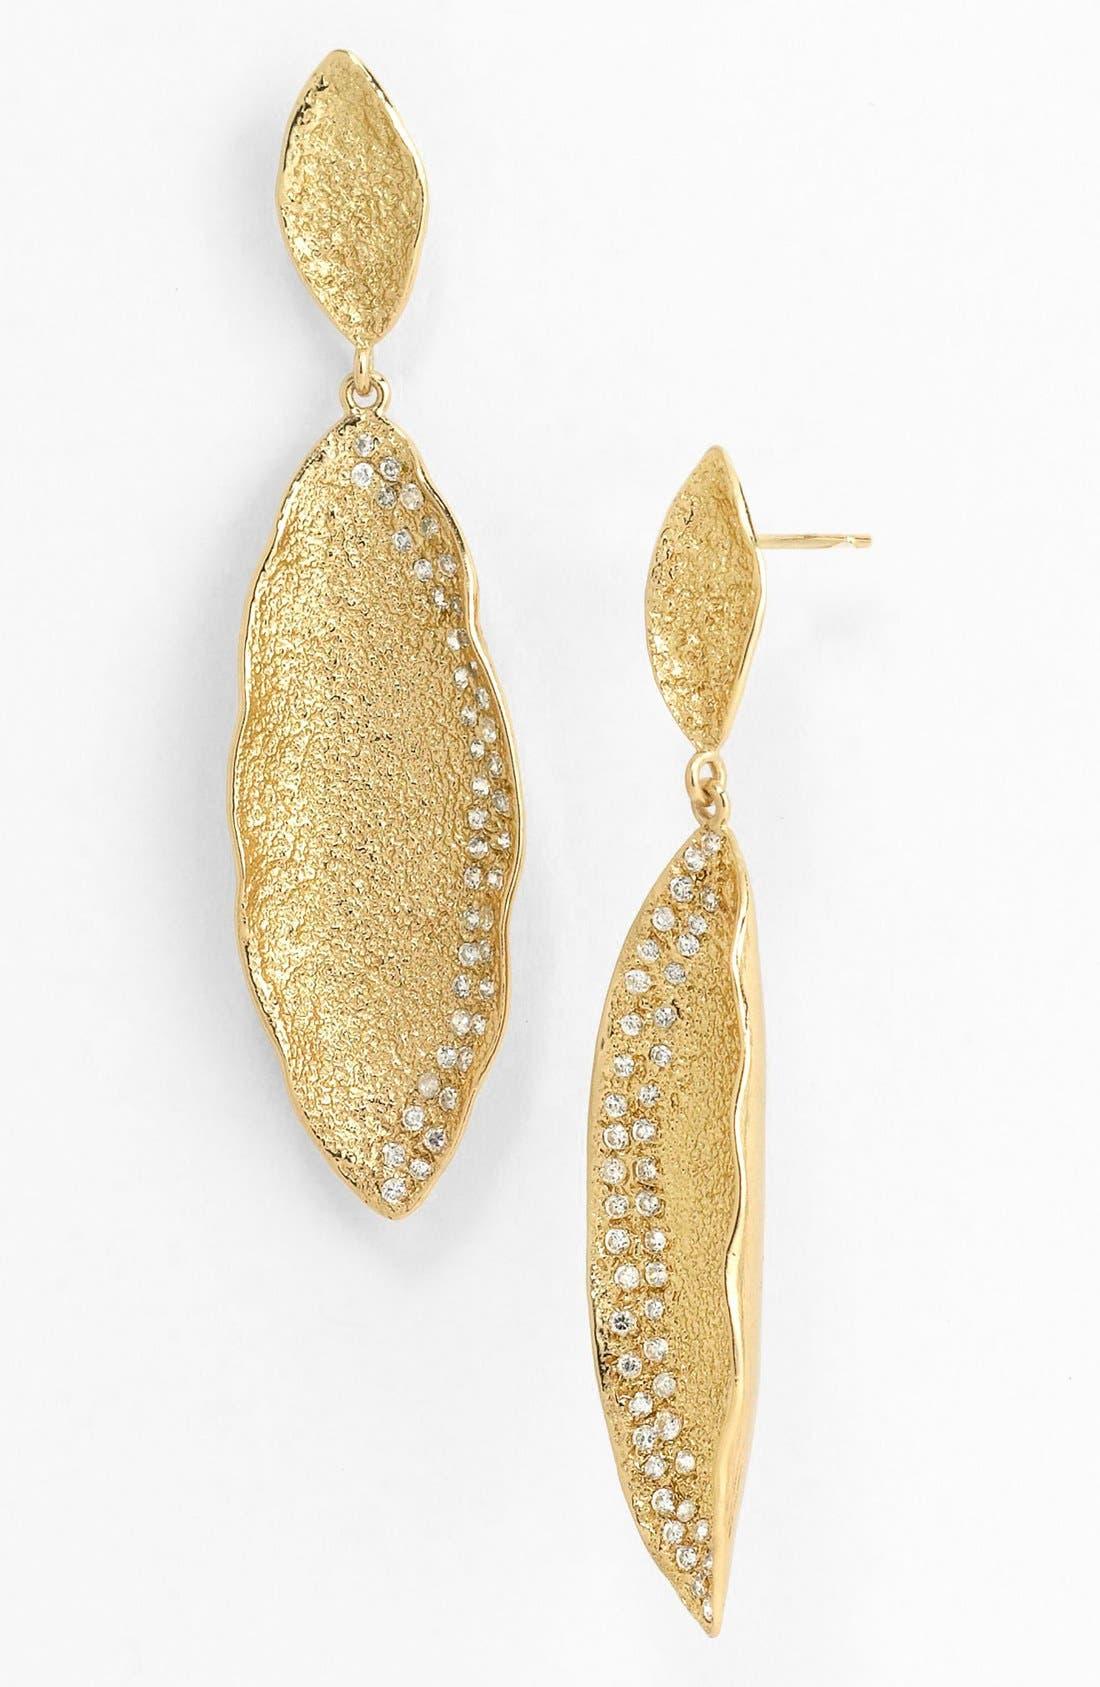 Alternate Image 1 Selected - Melinda Maria 'Mademoiselle' Pod Drop Earrings